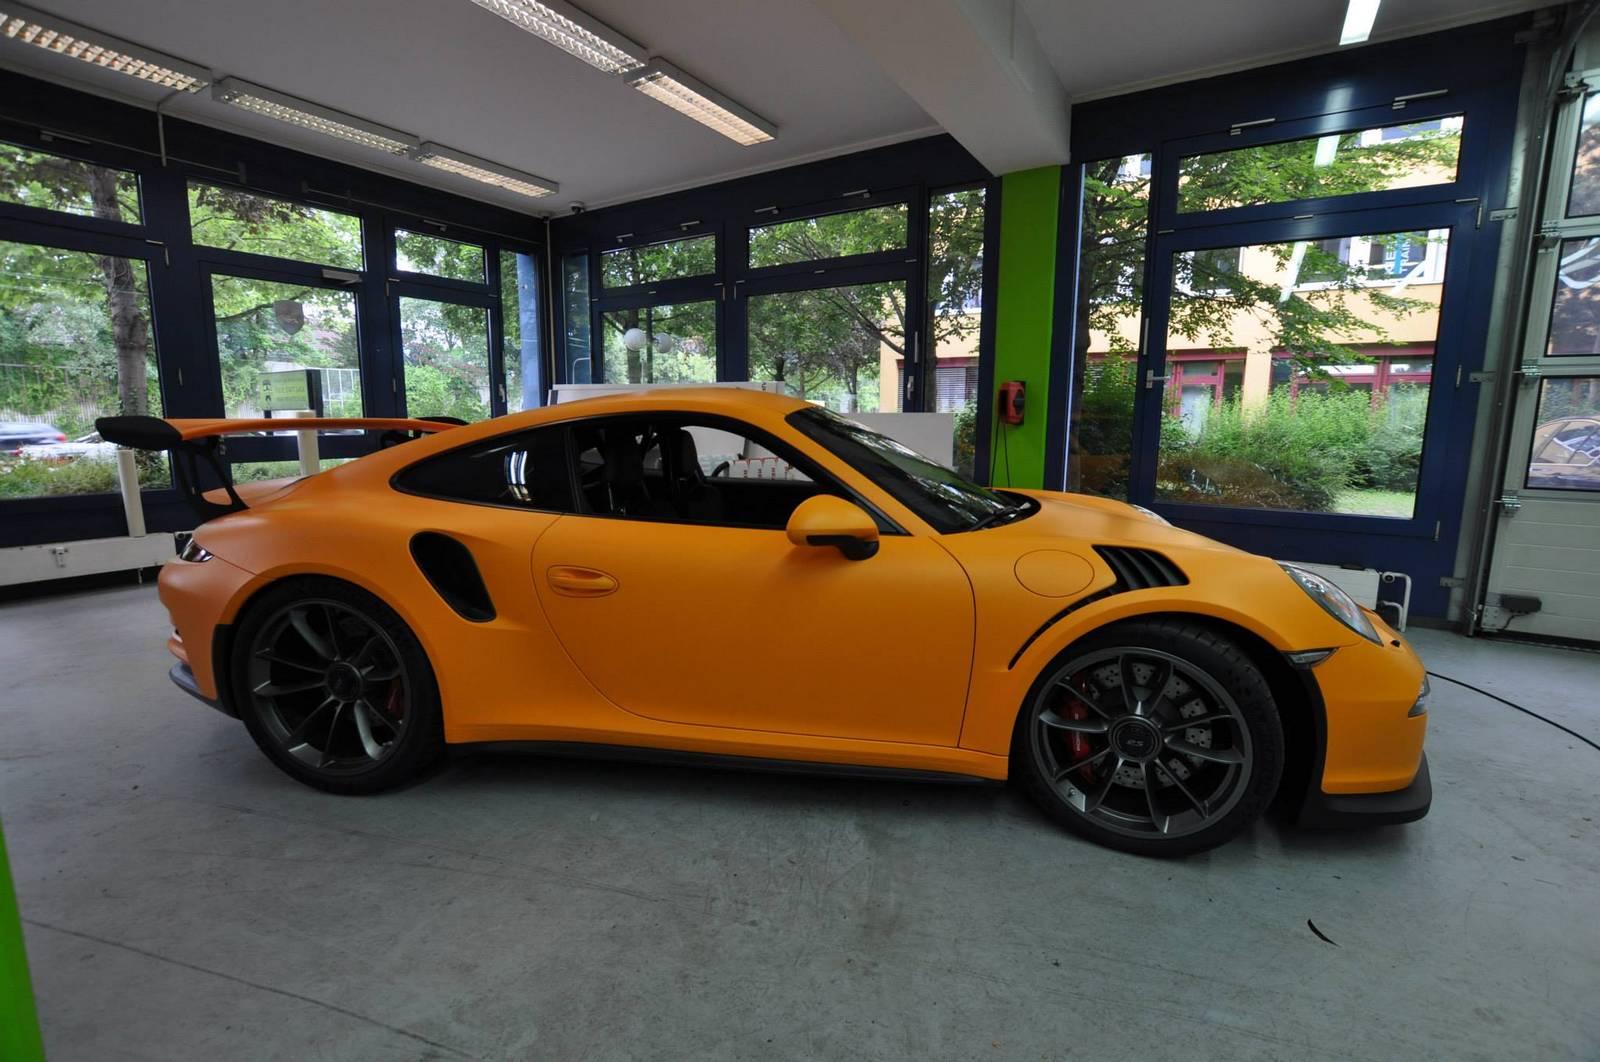 2016 porsche 911 gt3 rs wrapped in racing orange matt gtspirit. Black Bedroom Furniture Sets. Home Design Ideas